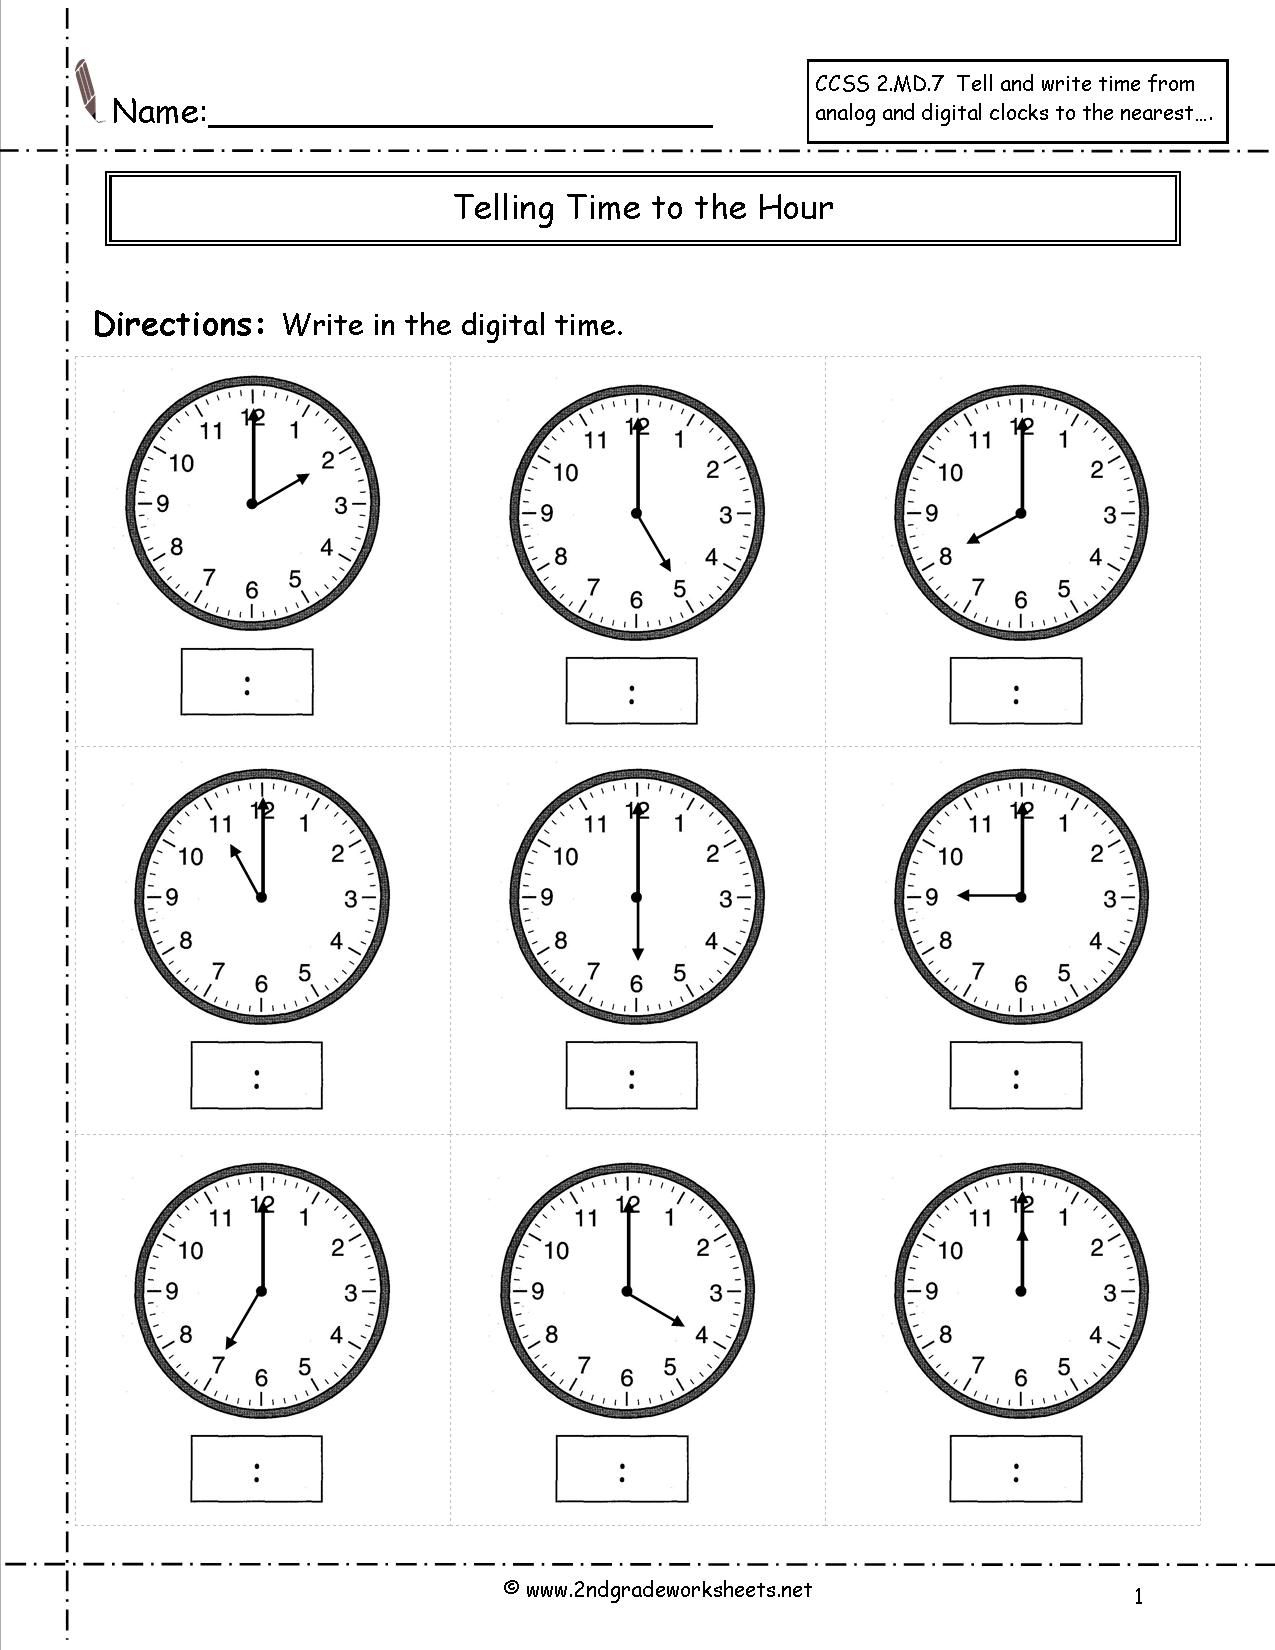 Telling Time Worksheets Half Hour | זמן | Clock Worksheets | Telling Time Printable Worksheets First Grade